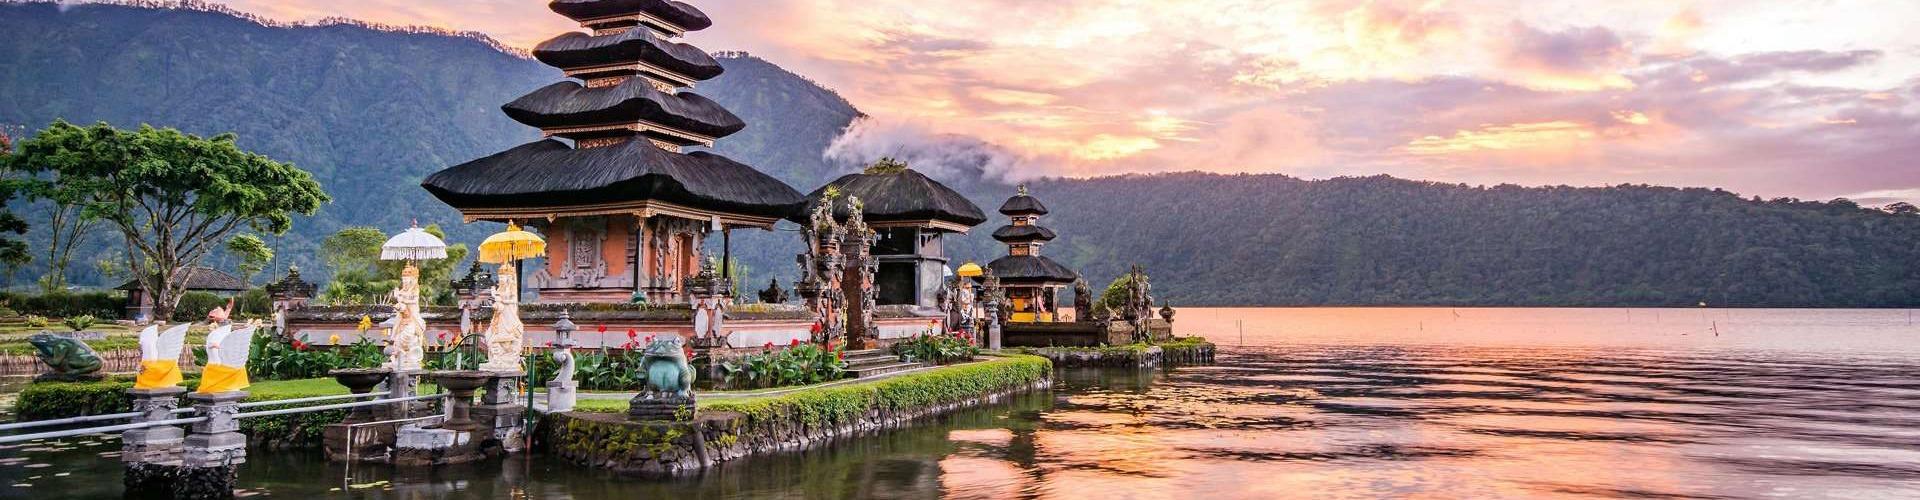 Singapur i Indonezja